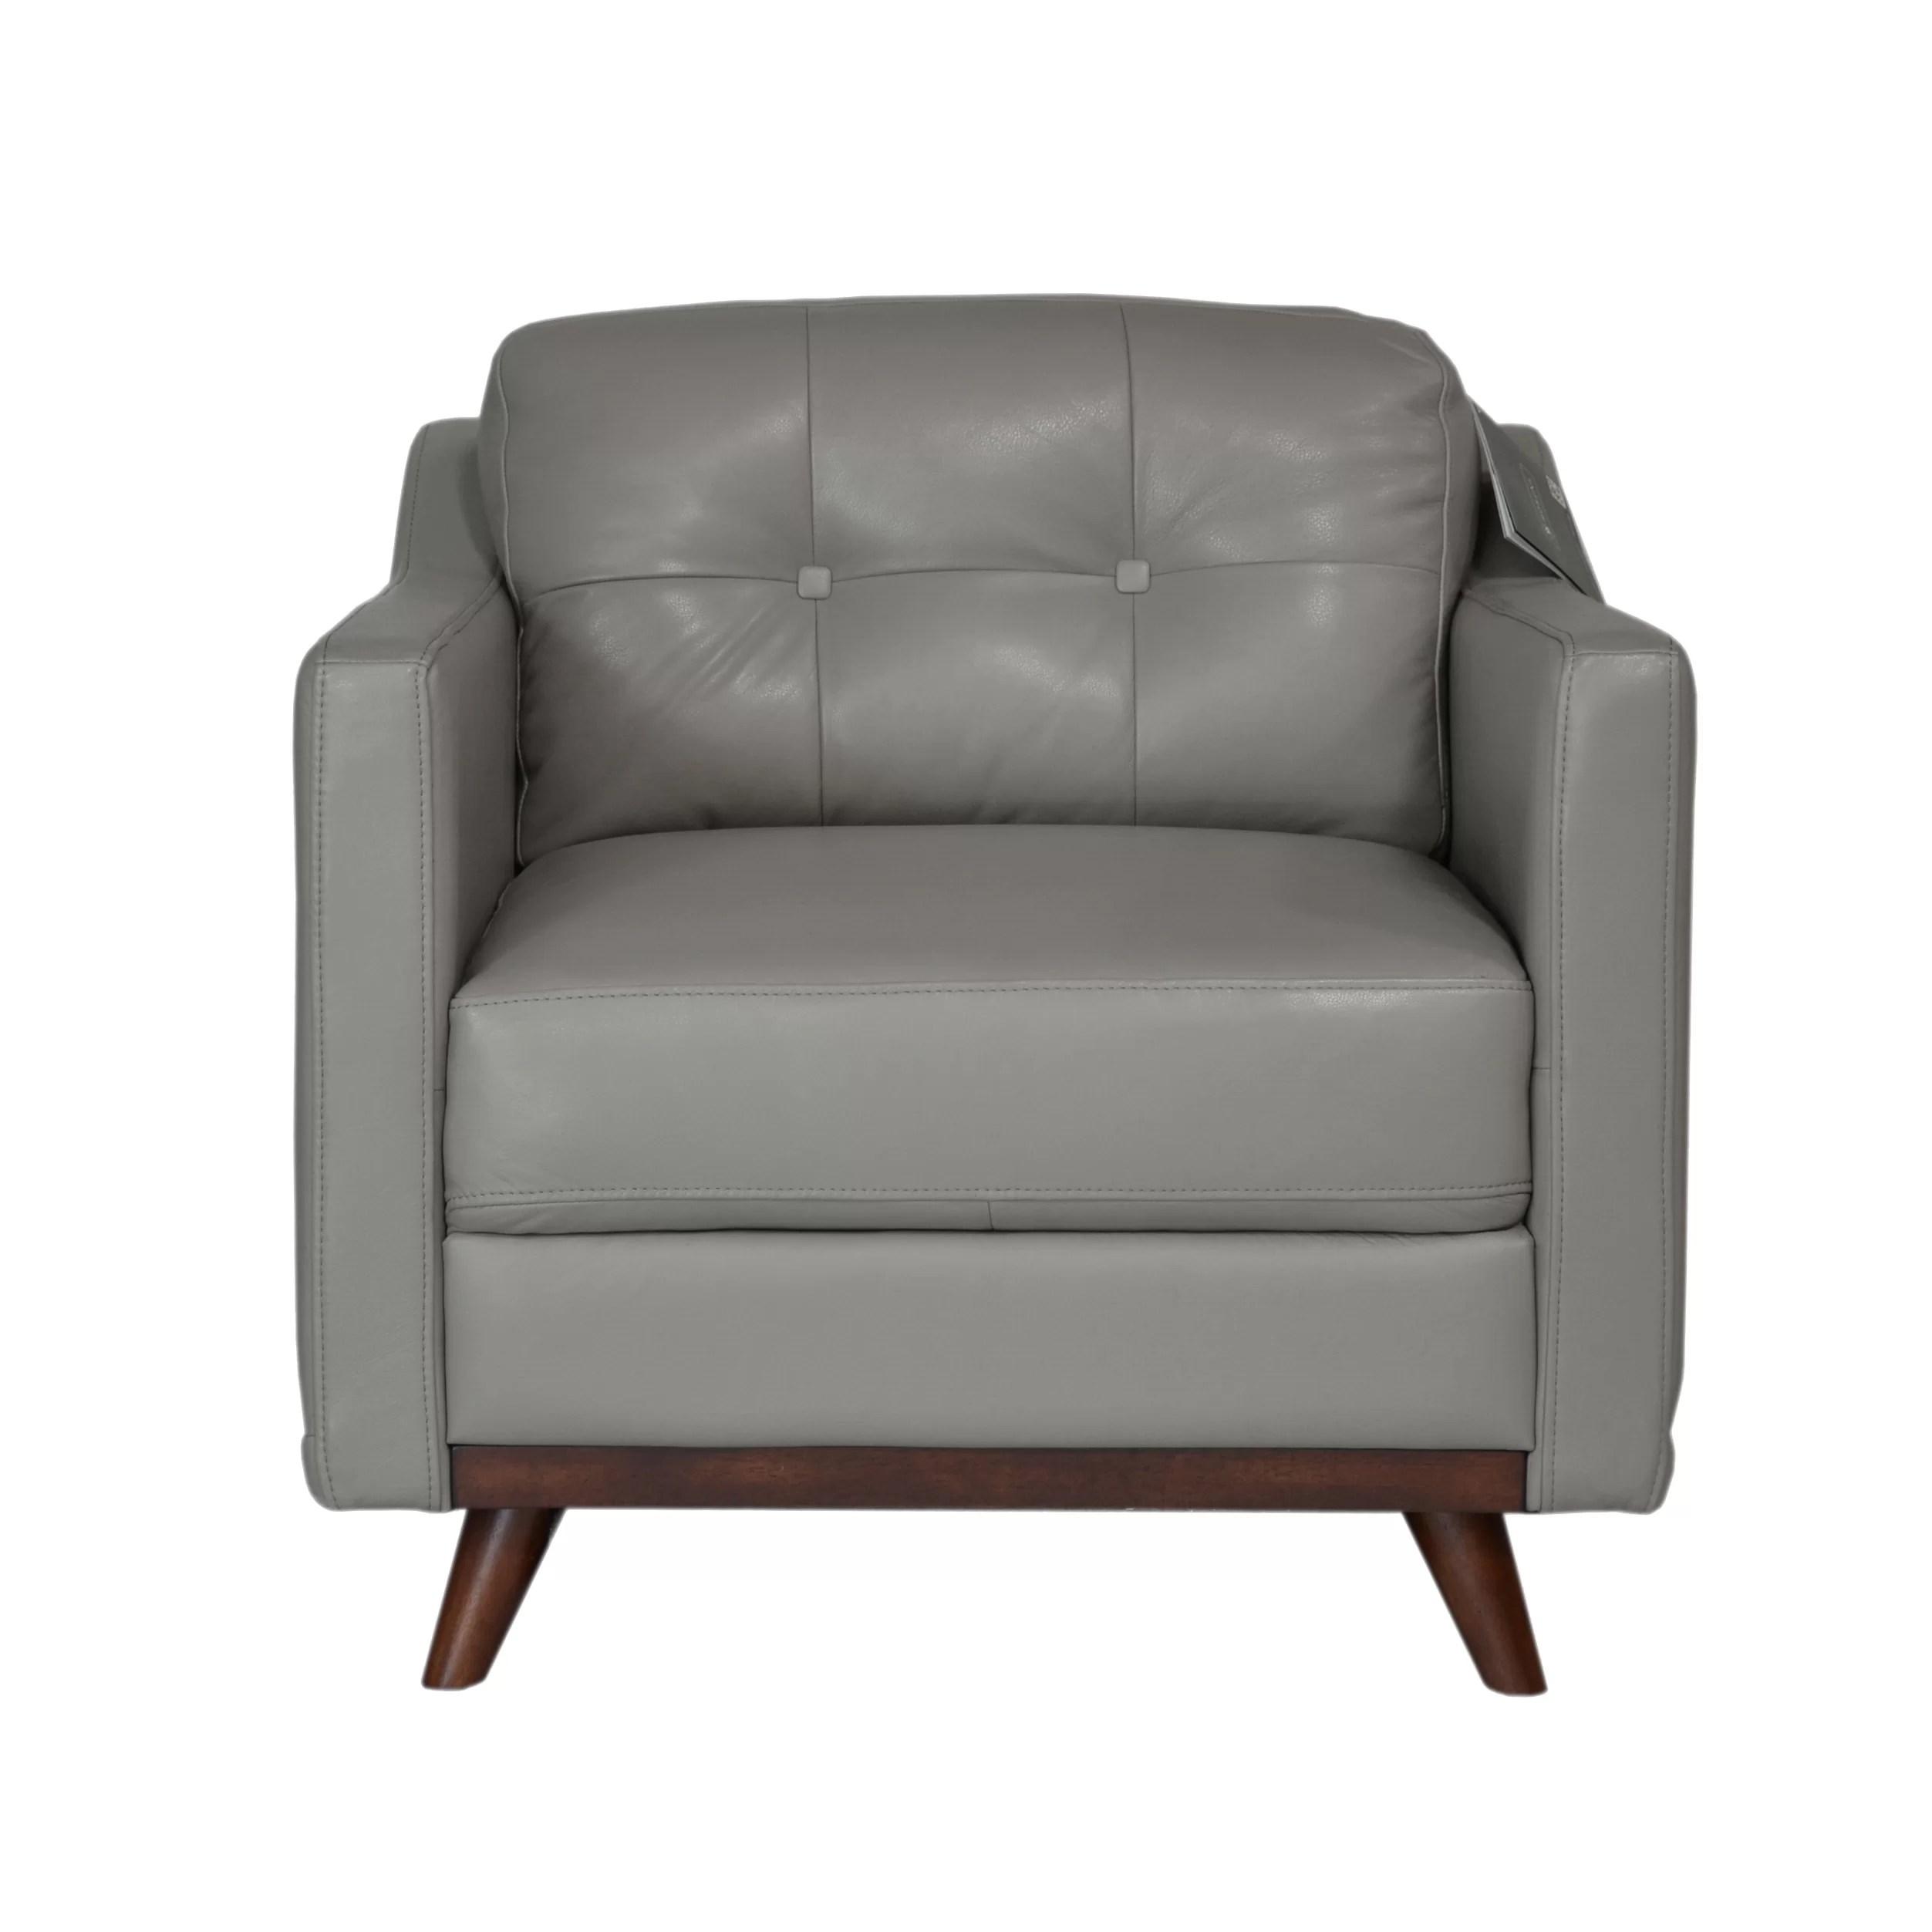 full grain leather chair where to buy covers in dubai moroni monika top wayfair ca